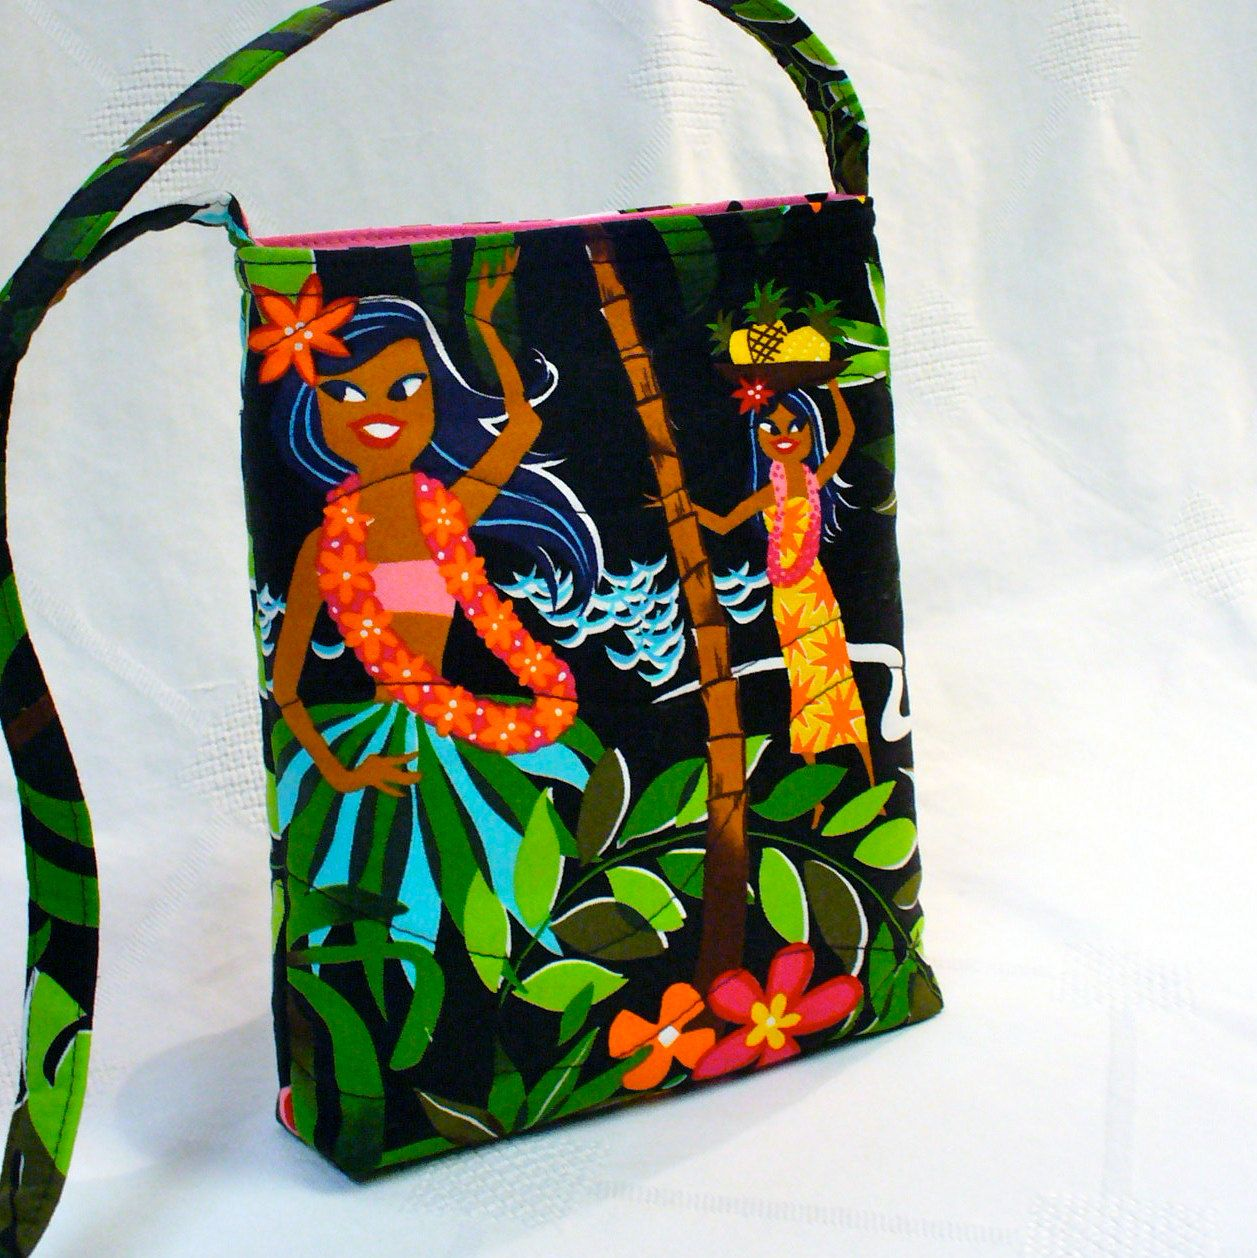 Small Sling Bag Messenger Bag Hawaiian Hula Girl by Heart2Handbags, $30.00